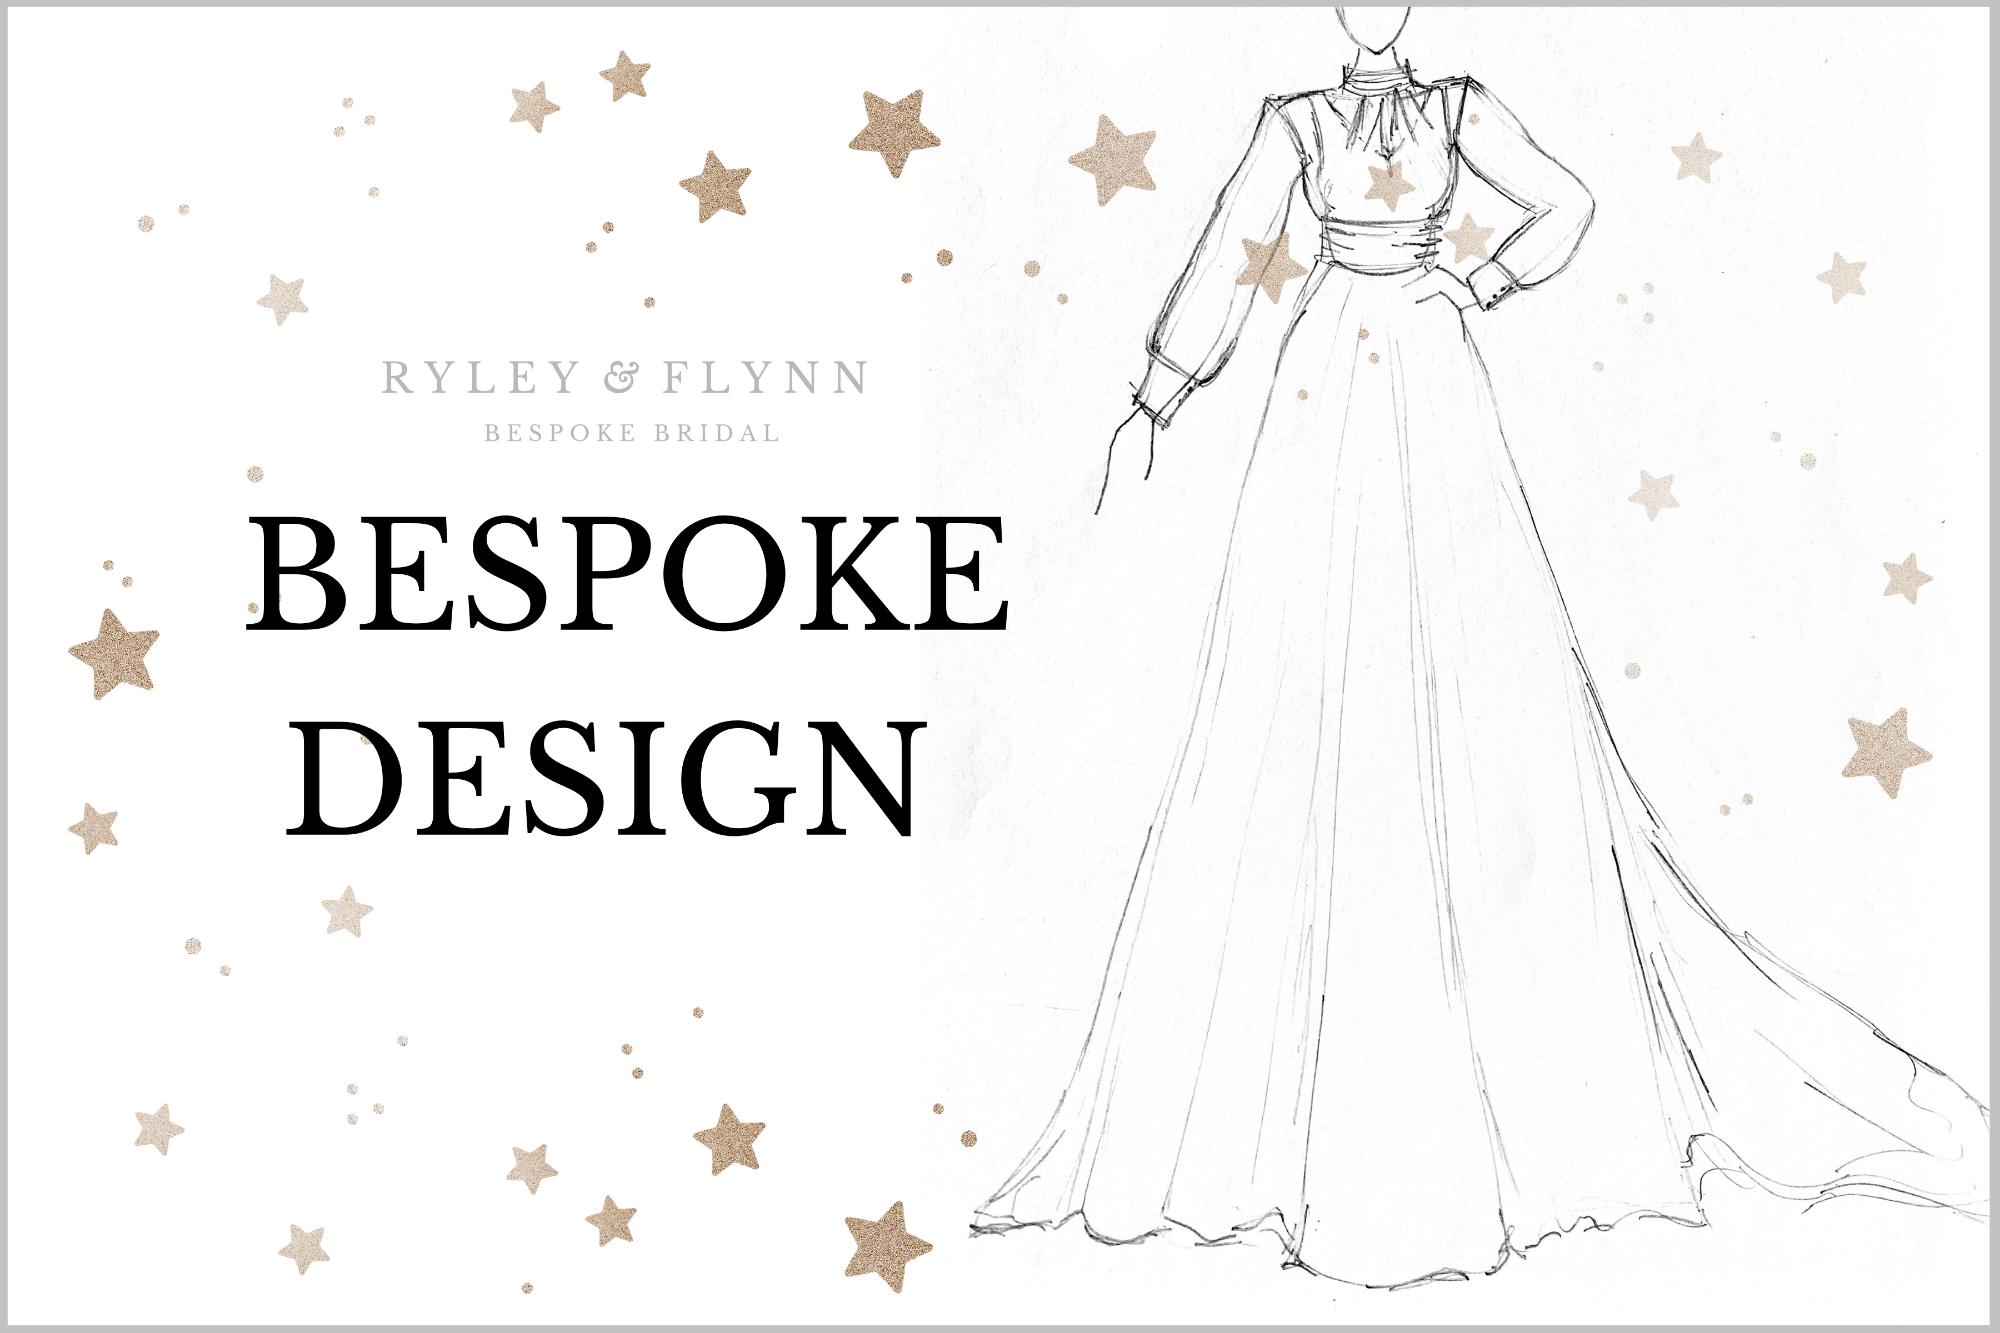 Bespoke design order